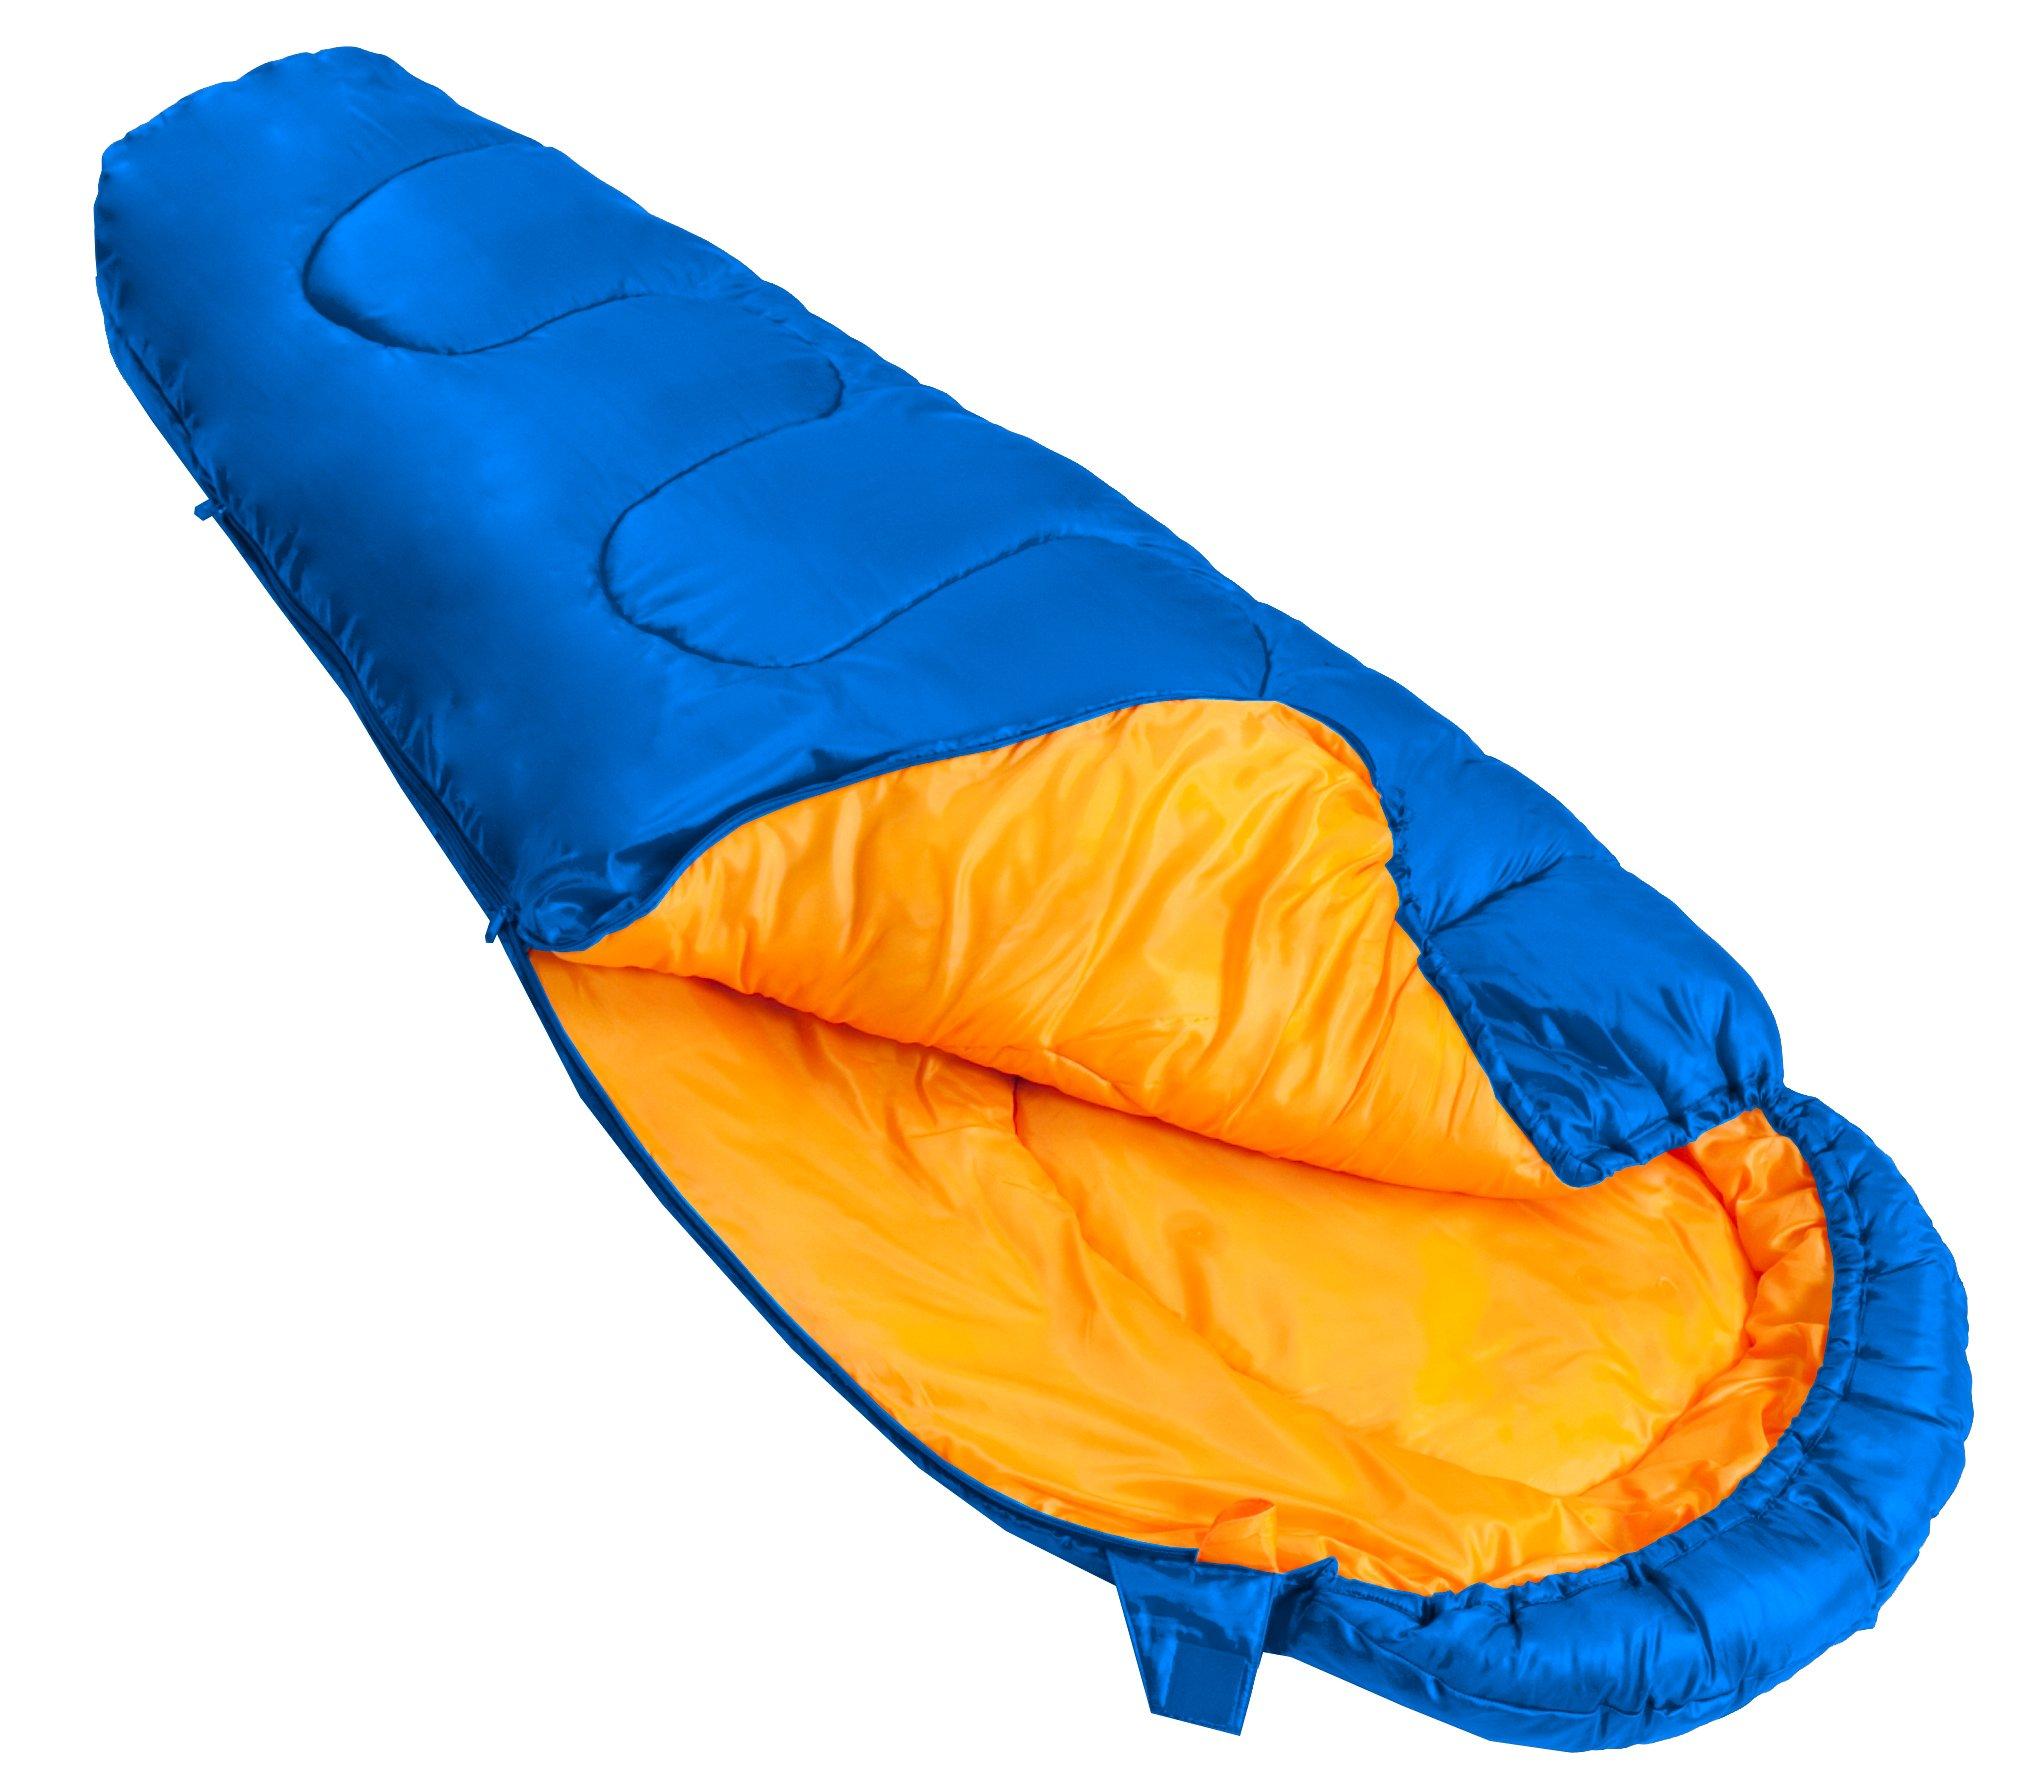 Vango Saturn Kids' Outdoor Sleeping Bag available in Atlantic - Size 170 x 70 cm 2